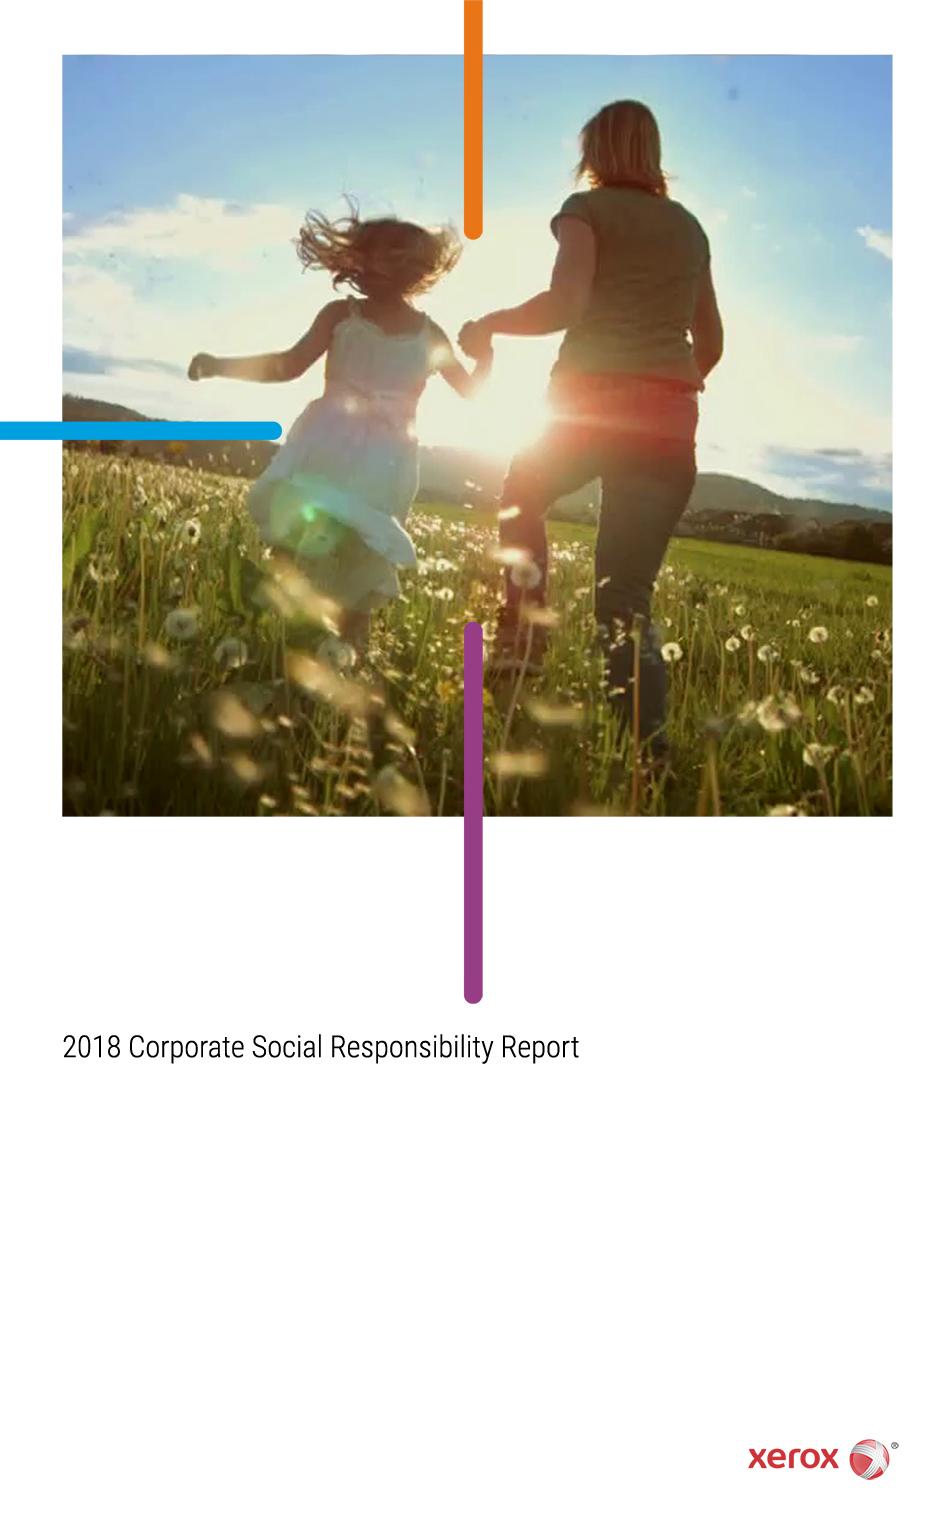 xerox corporate social responsibility